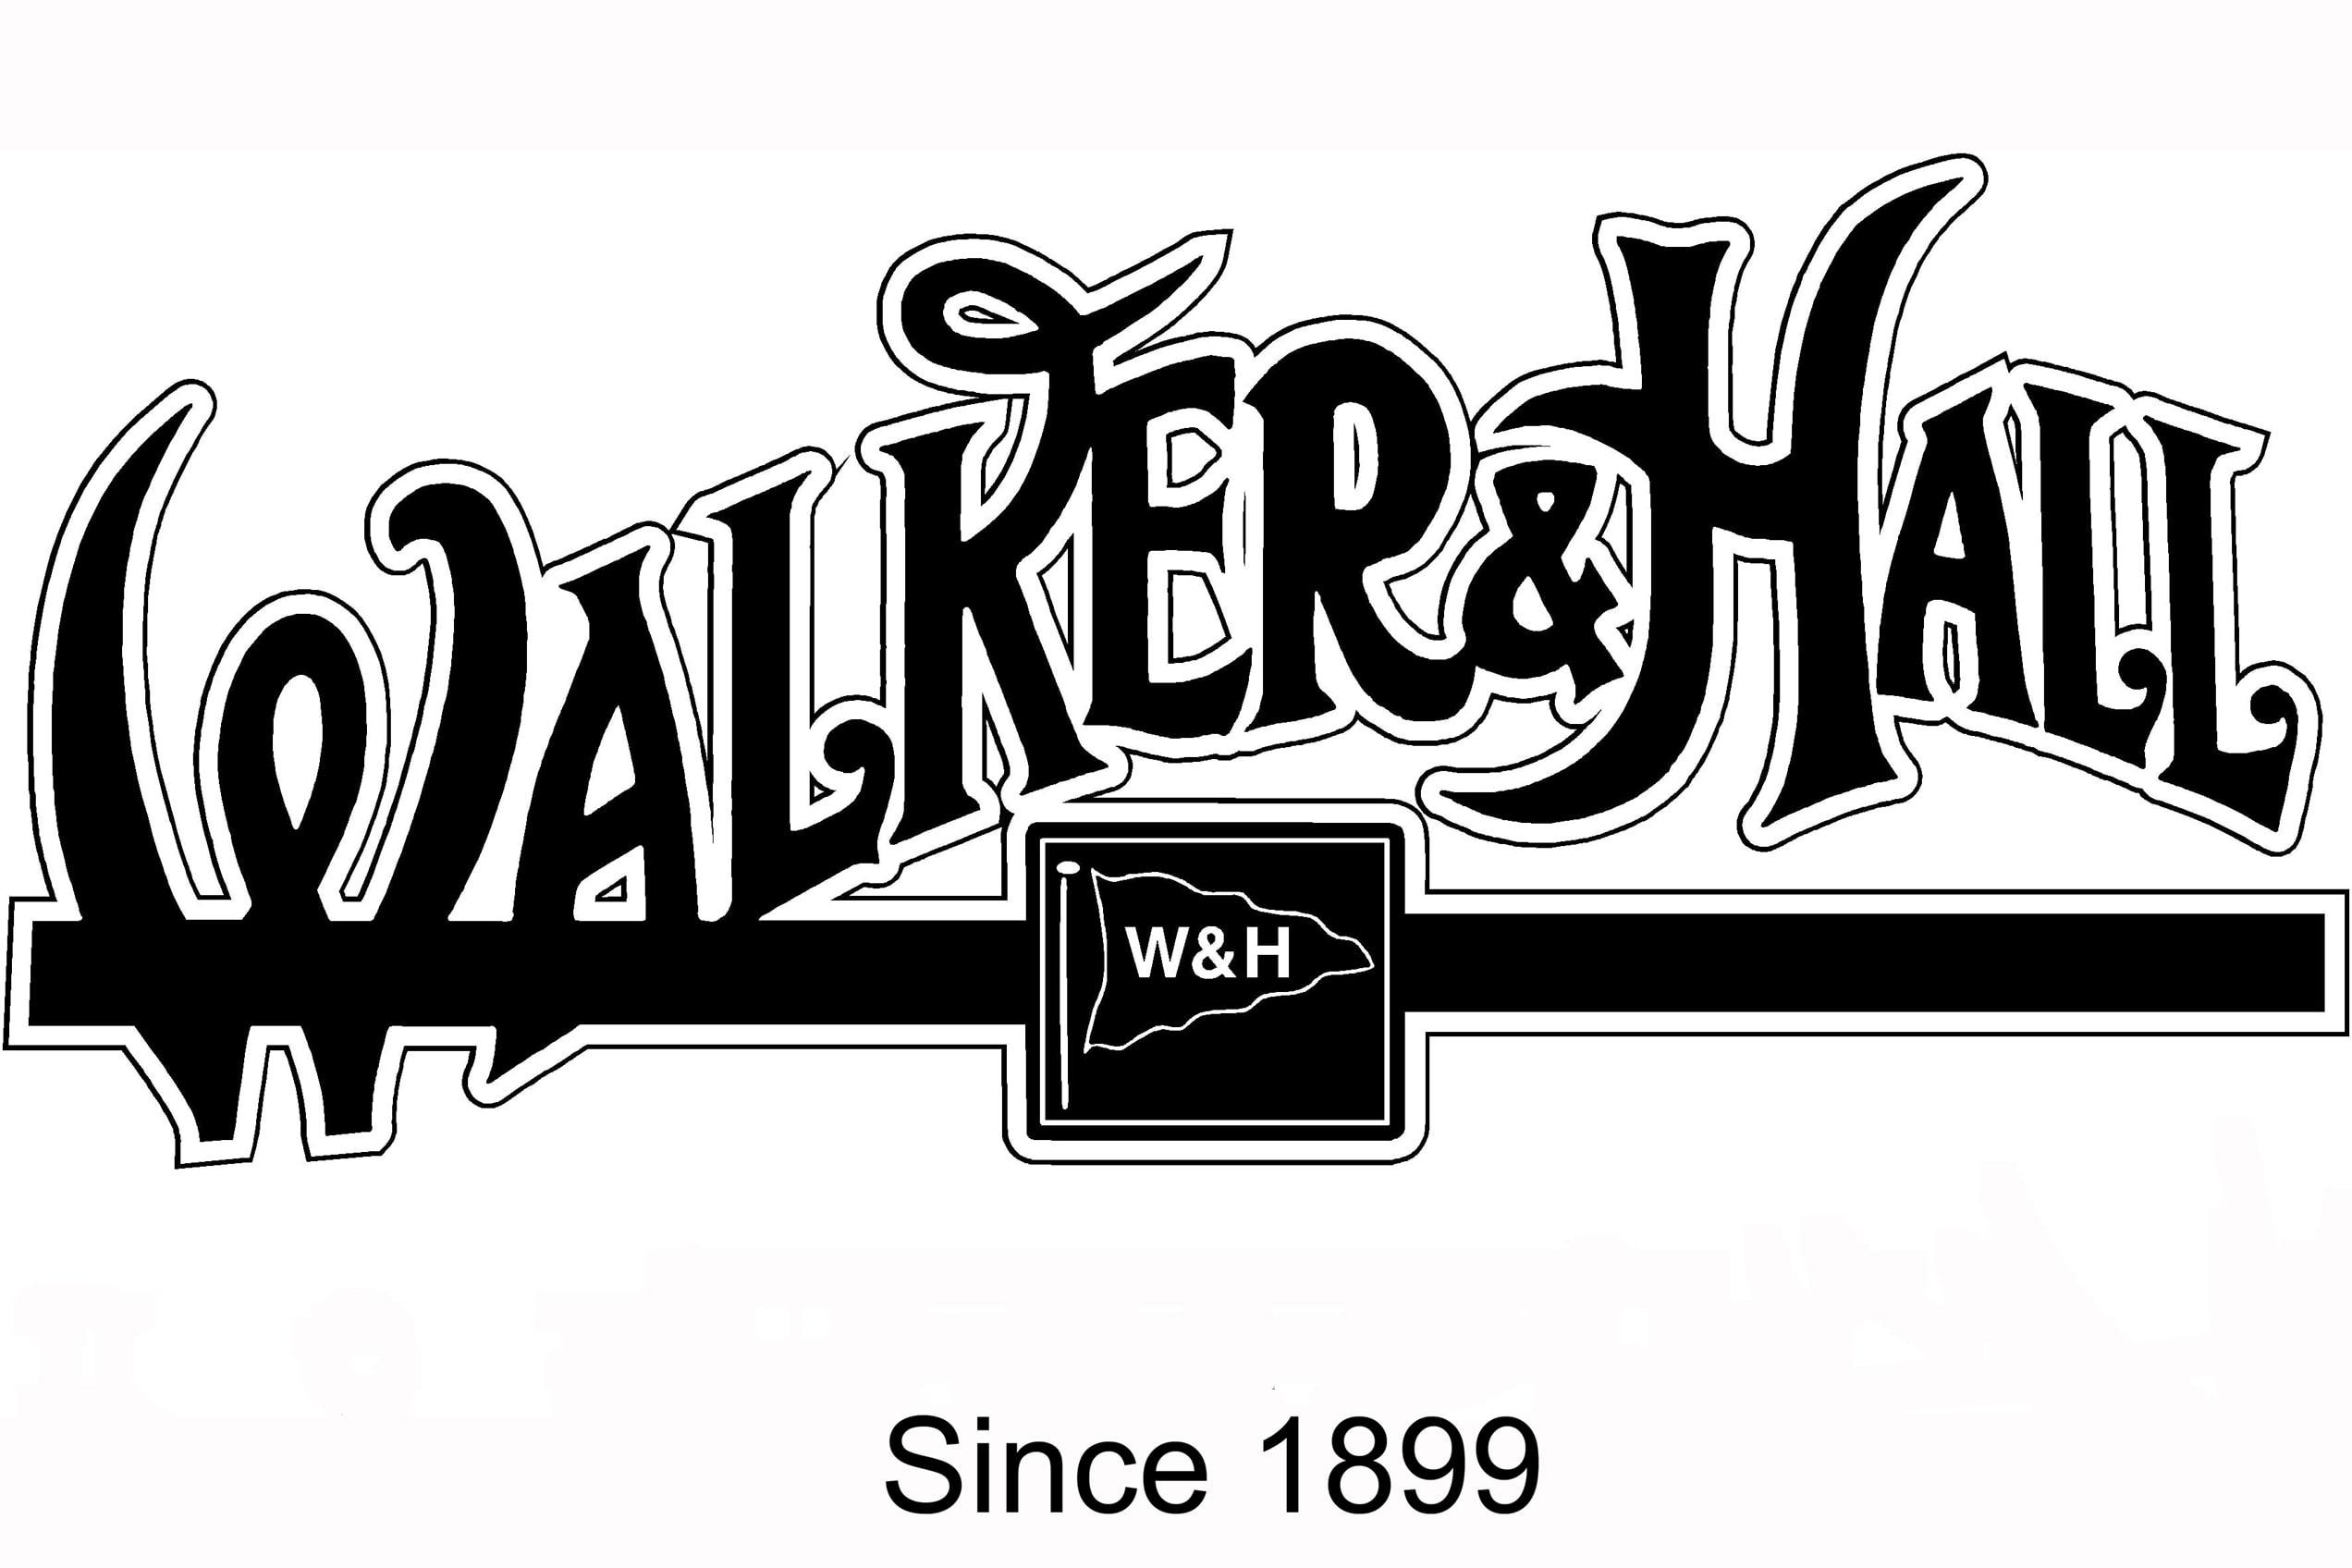 Walker & Hall